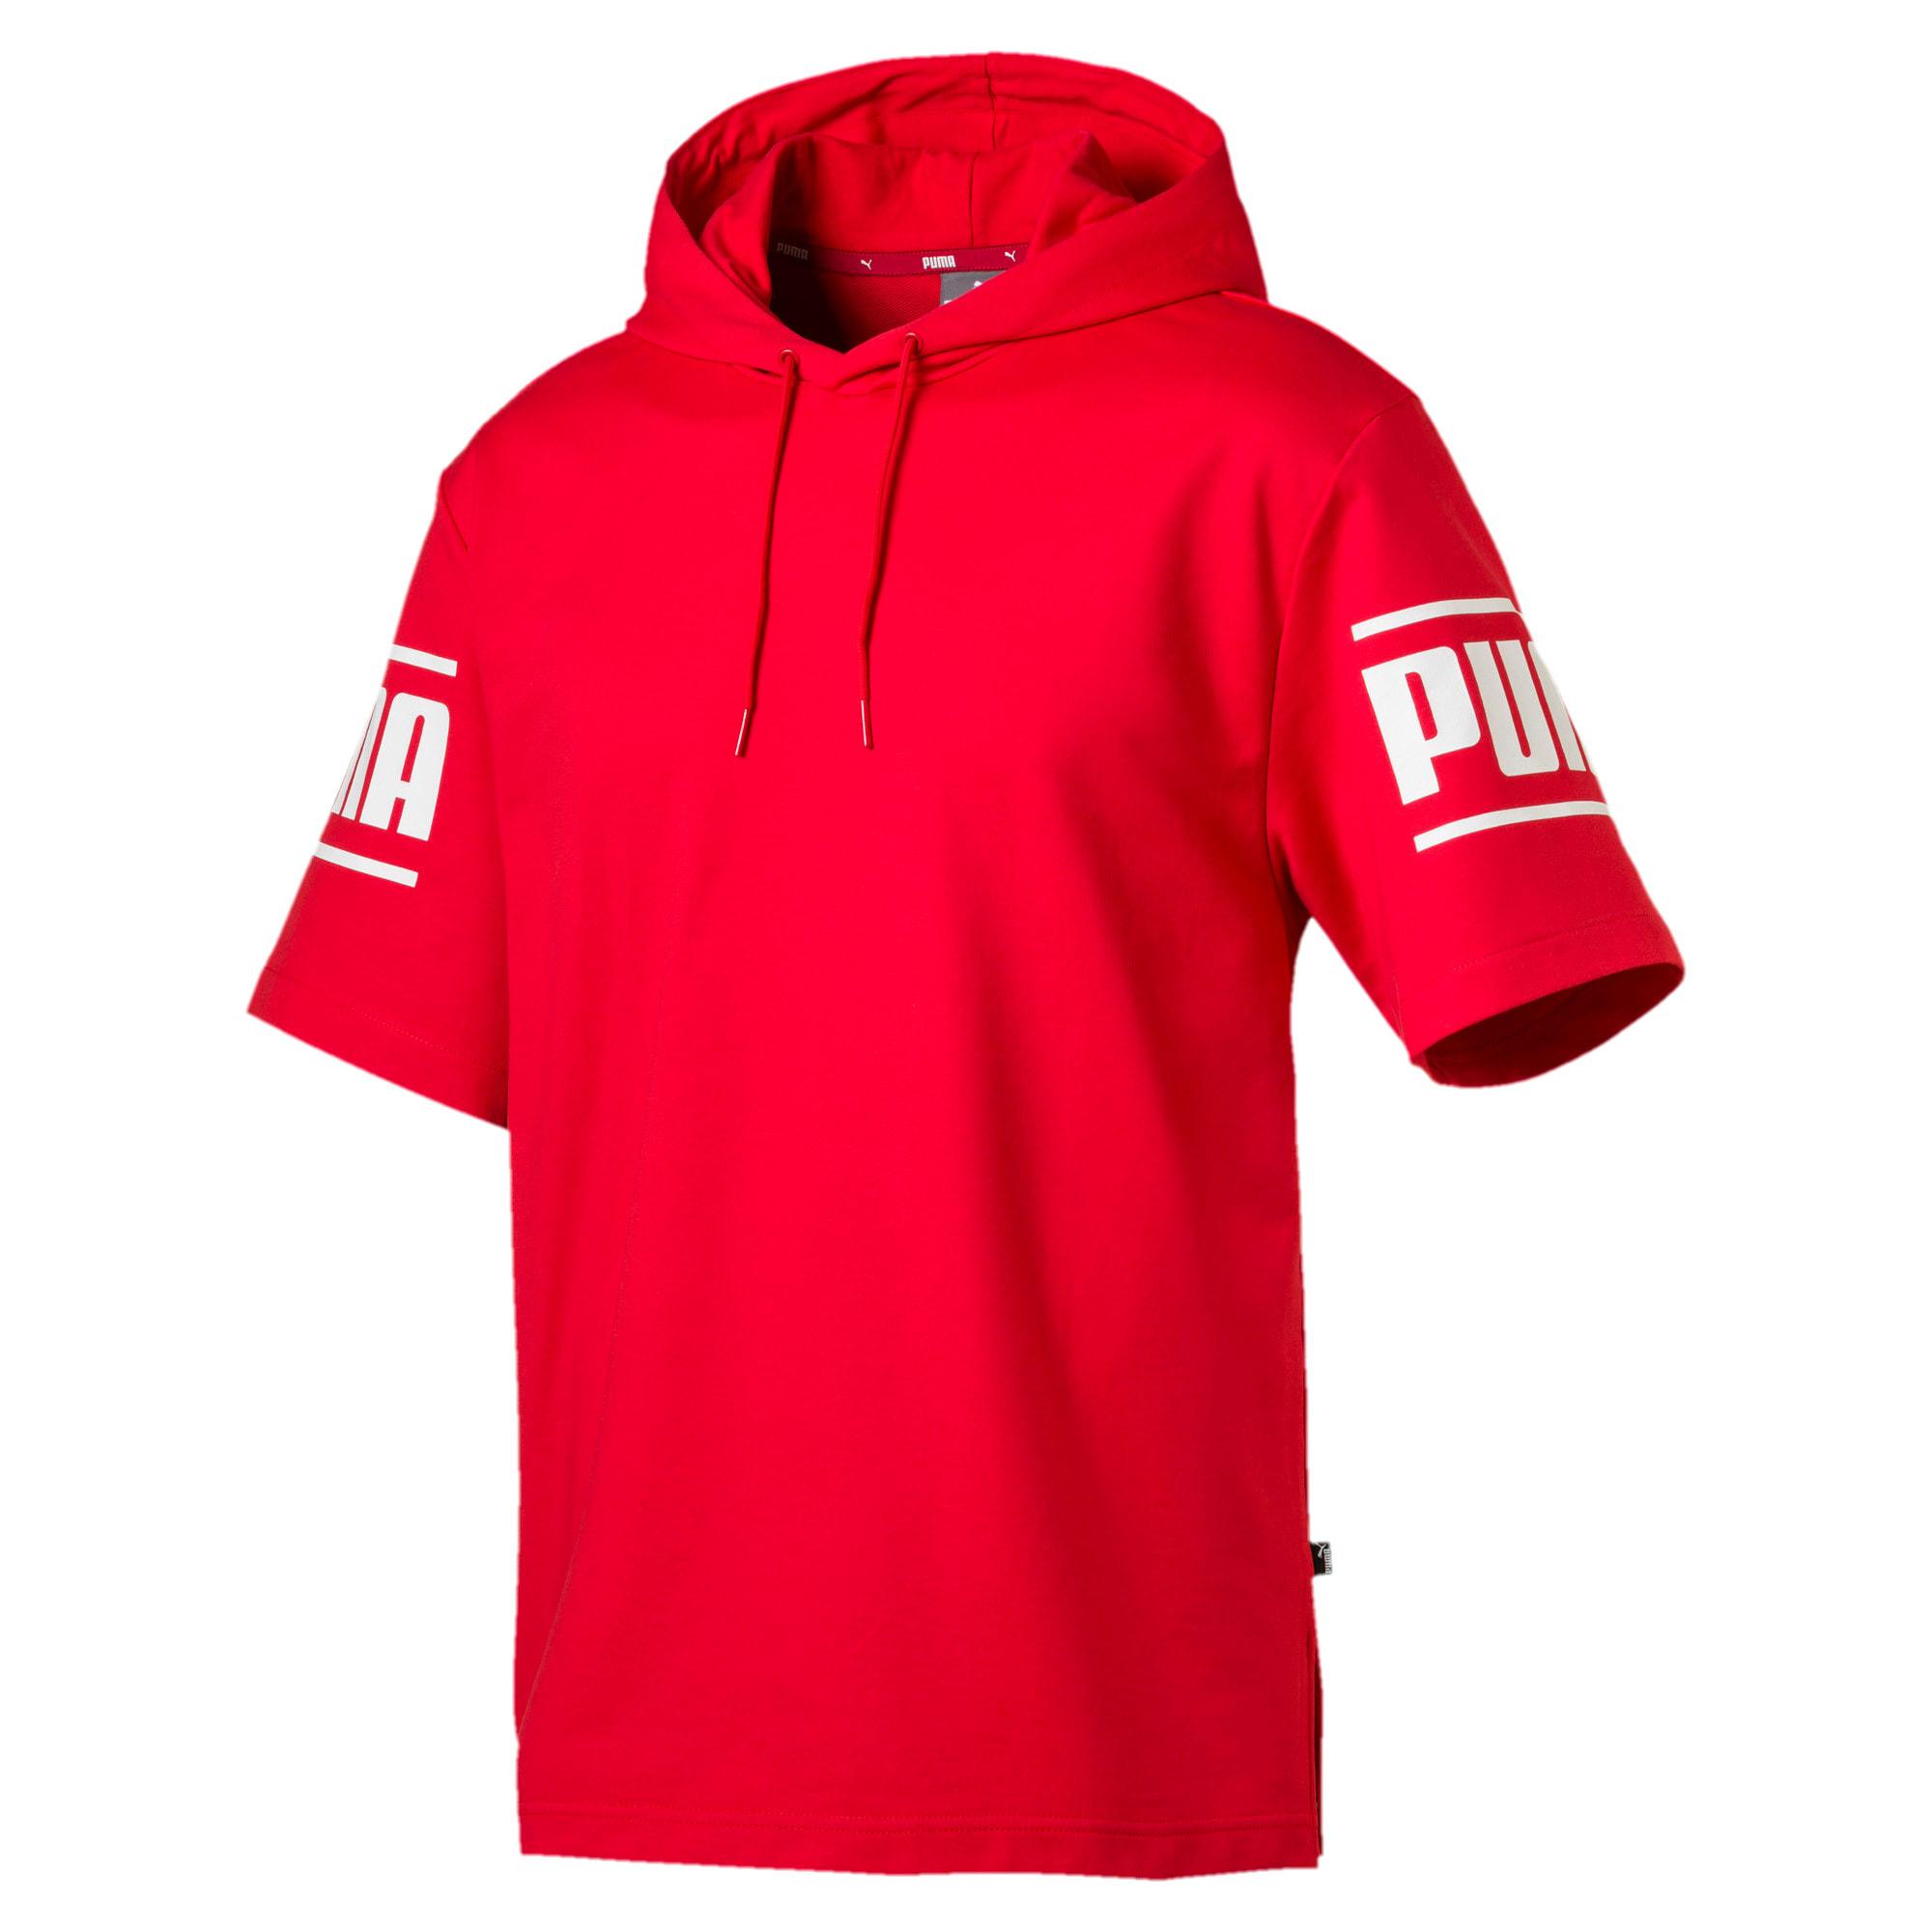 Thumbnail 1 of Camo Pack Men's Short Sleeve Hoodie, High Risk Red, medium